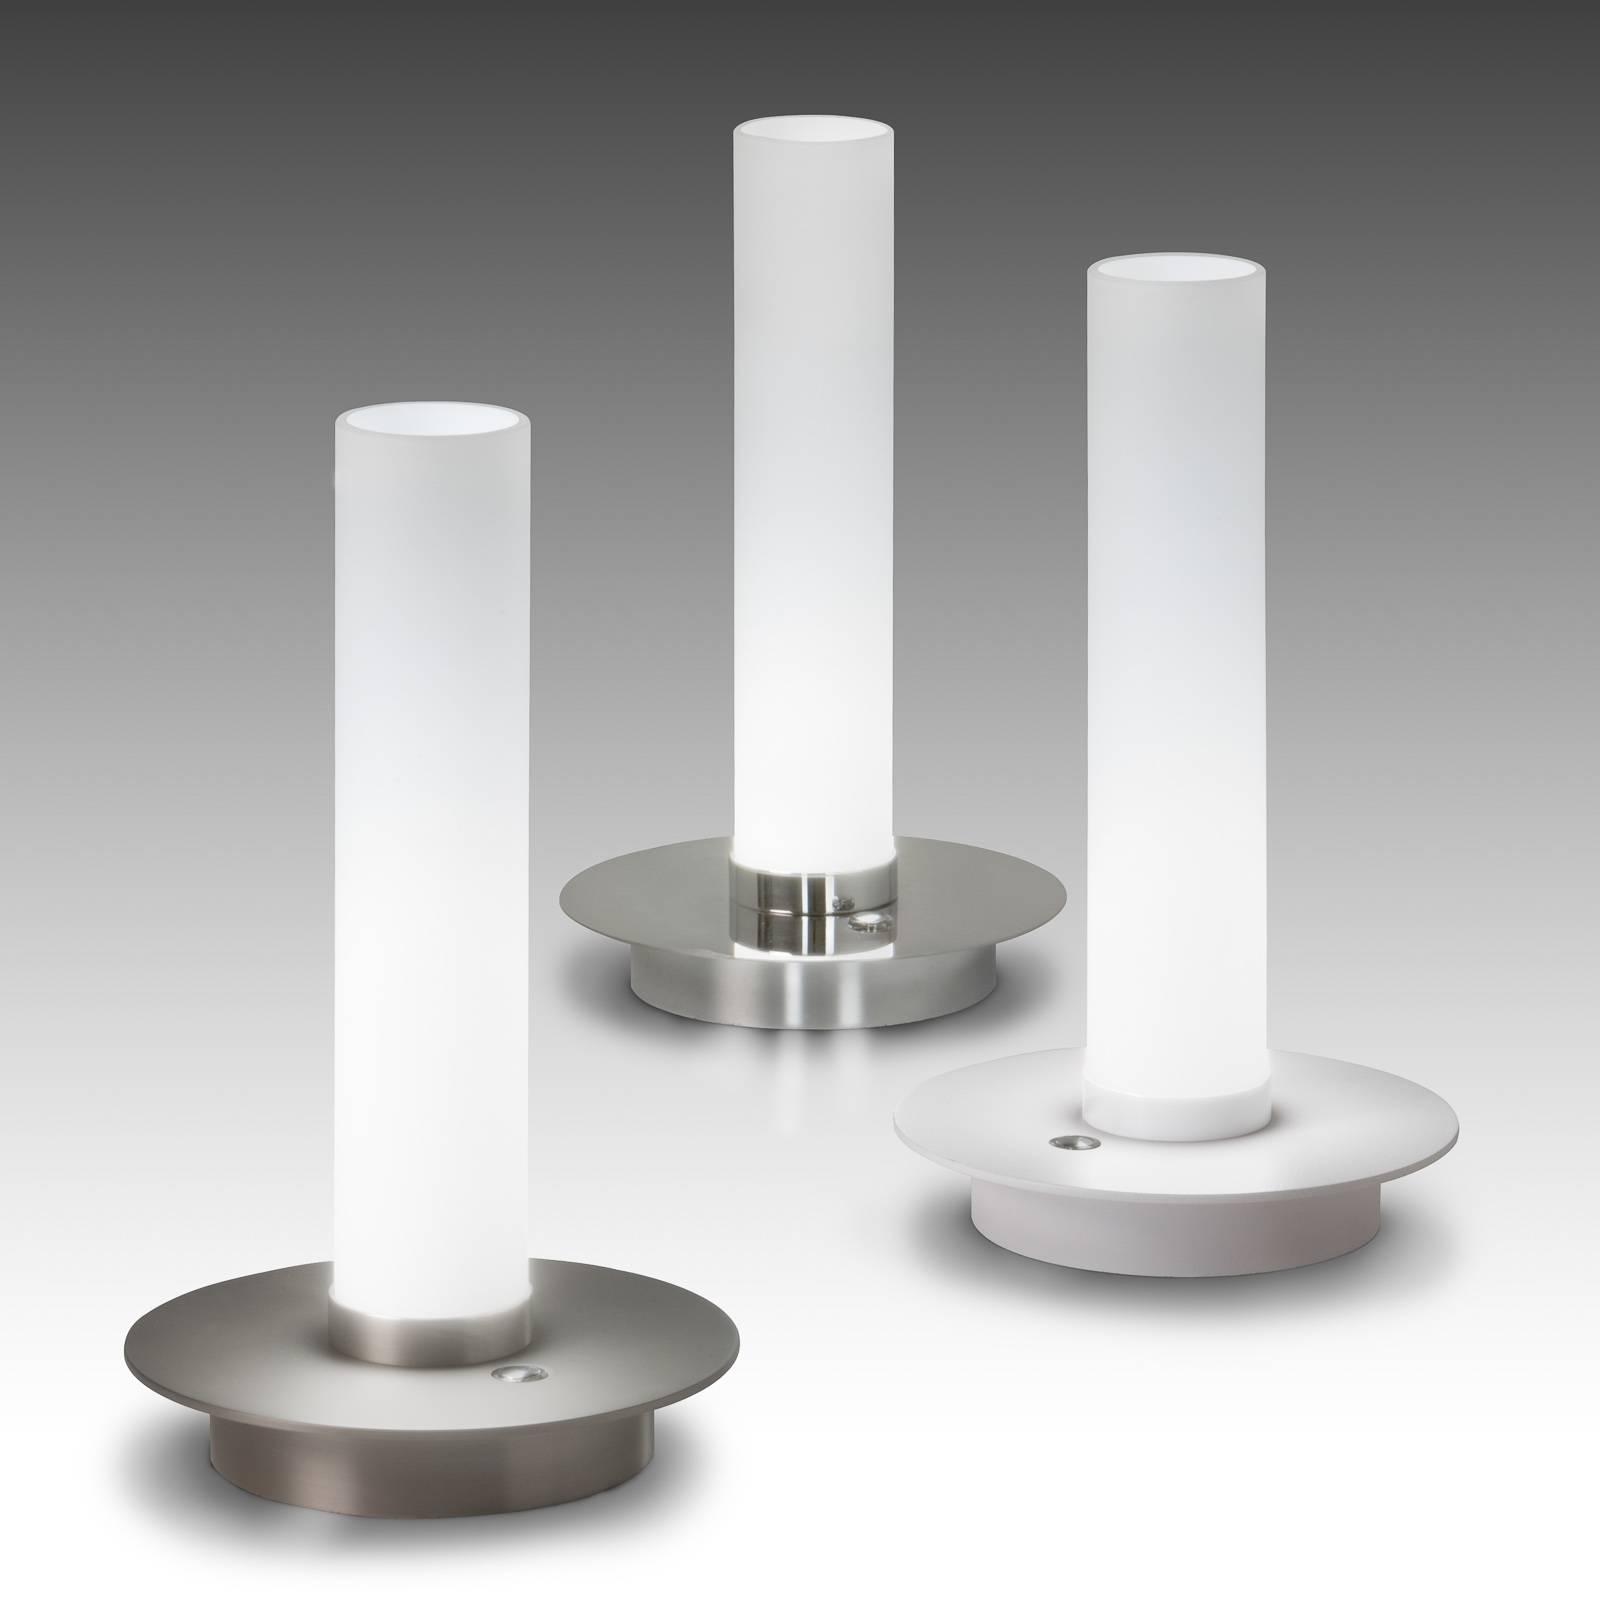 LED-Tischleuchte Candle, chrom